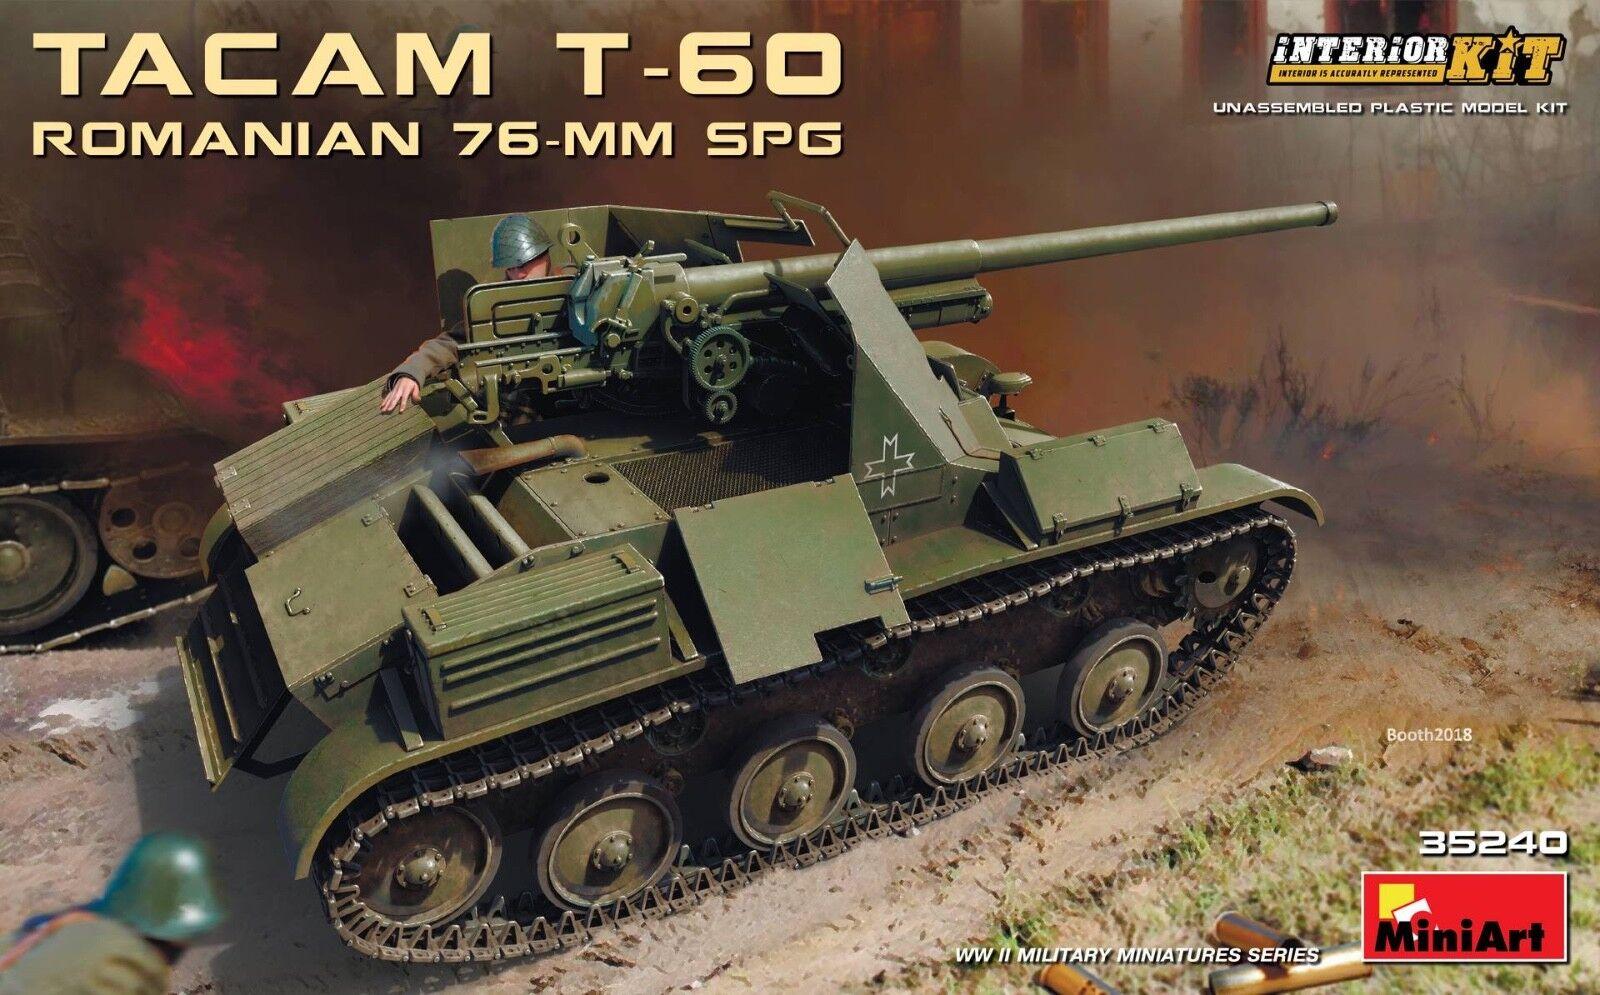 1 35 MINIART ROMANIAN 76-mm SPG TACAM T-60 INTERIOR KIT